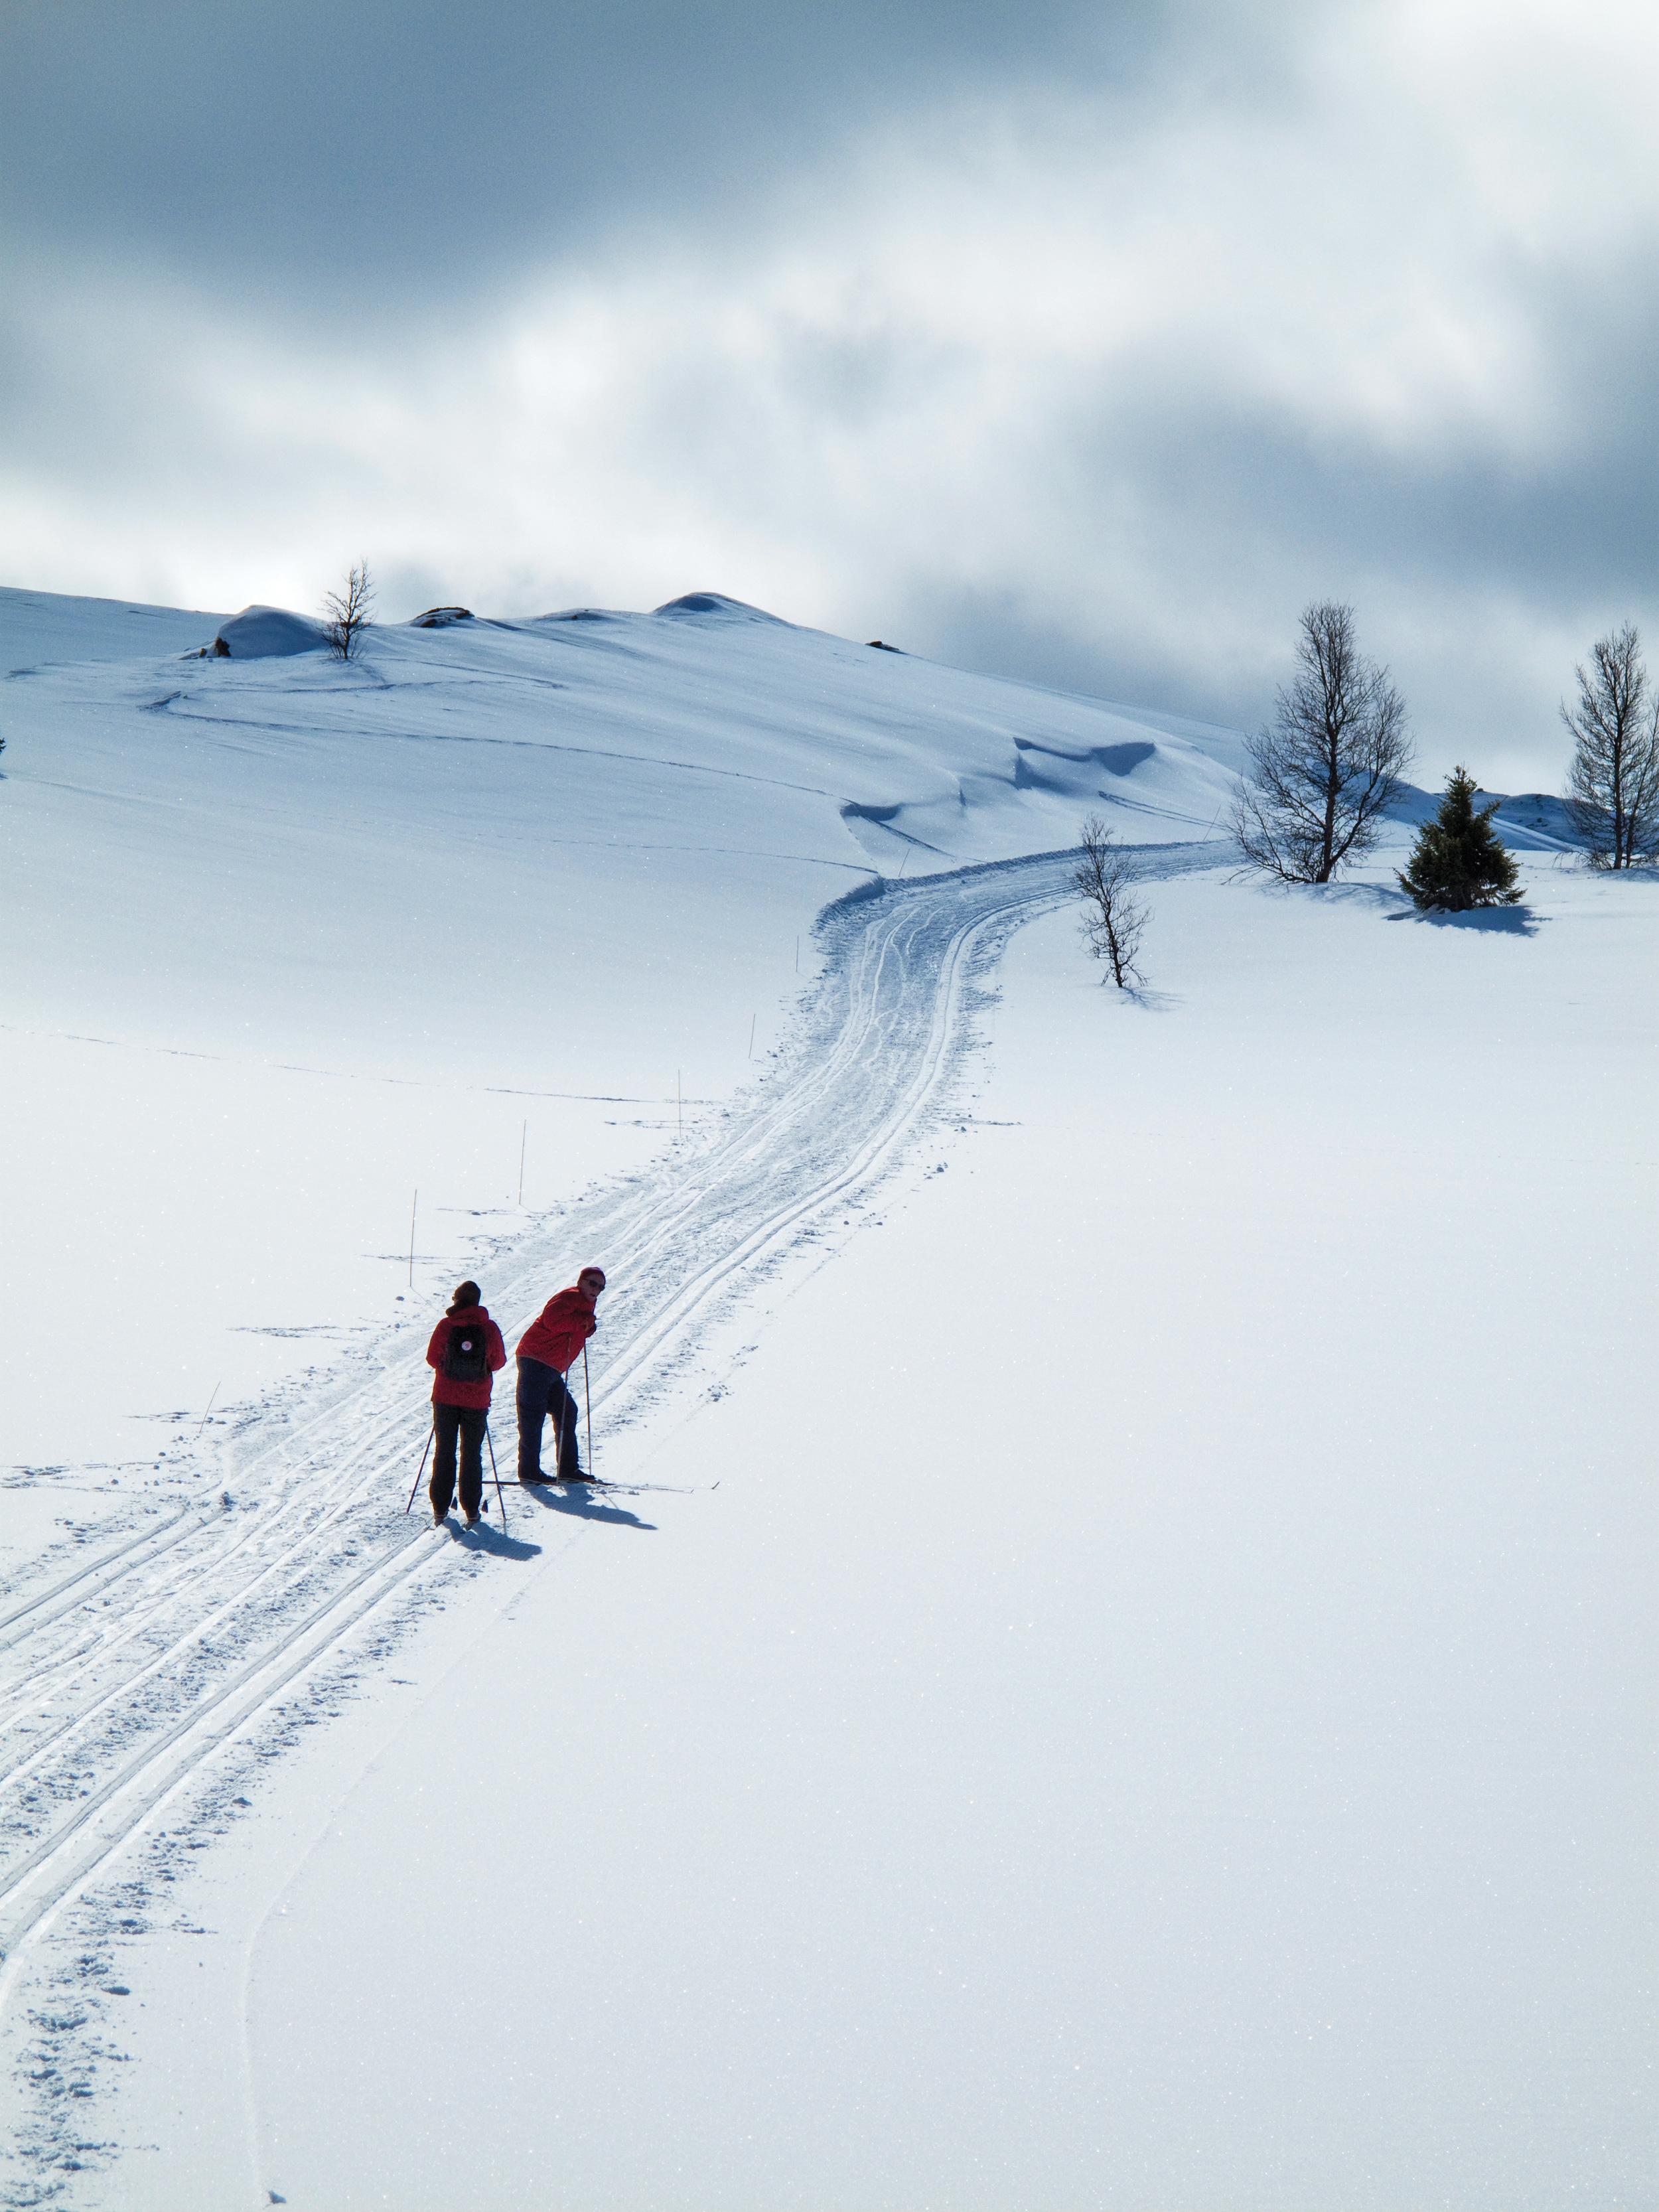 Det var en markert økning i skiturer fra 2007 til 2011, men den senere trenden har vært nedadgående. Foto: Lars Sandved Dalen, NIBIO